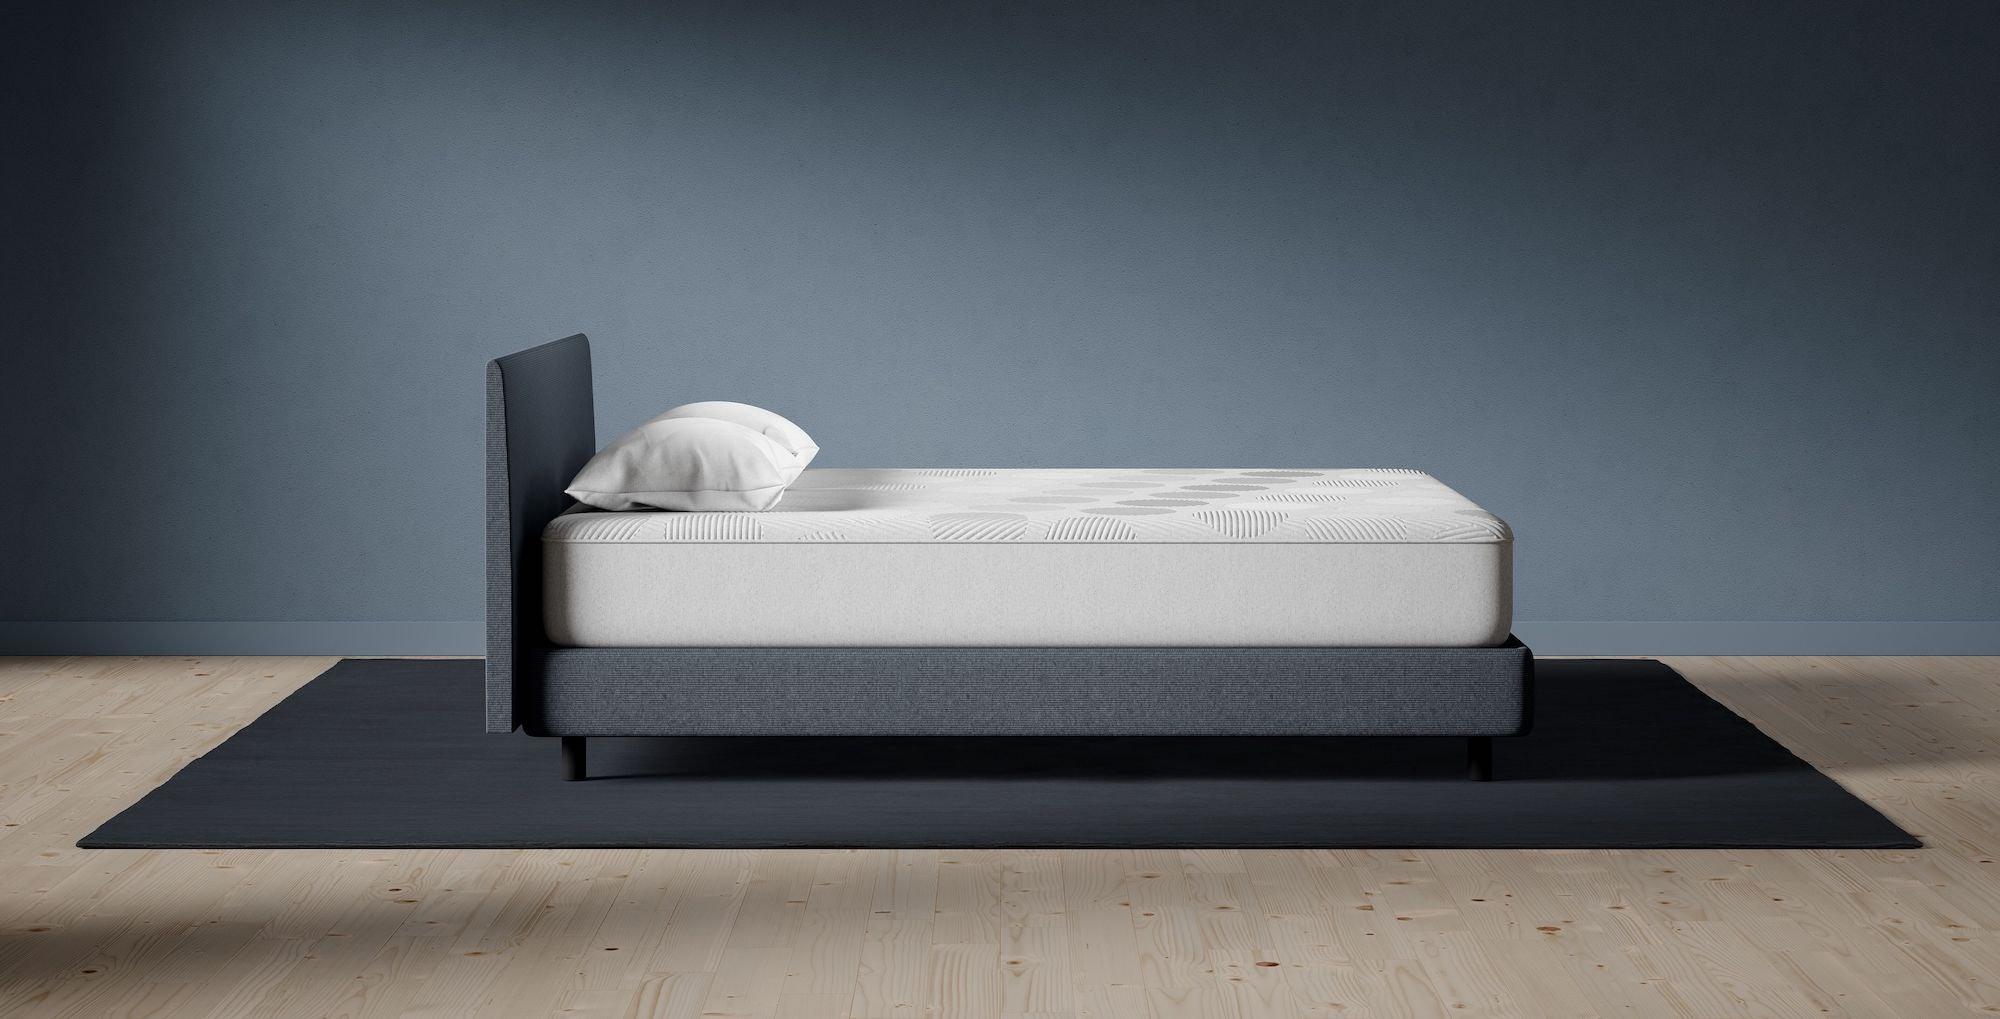 Casper original hybrid mattress